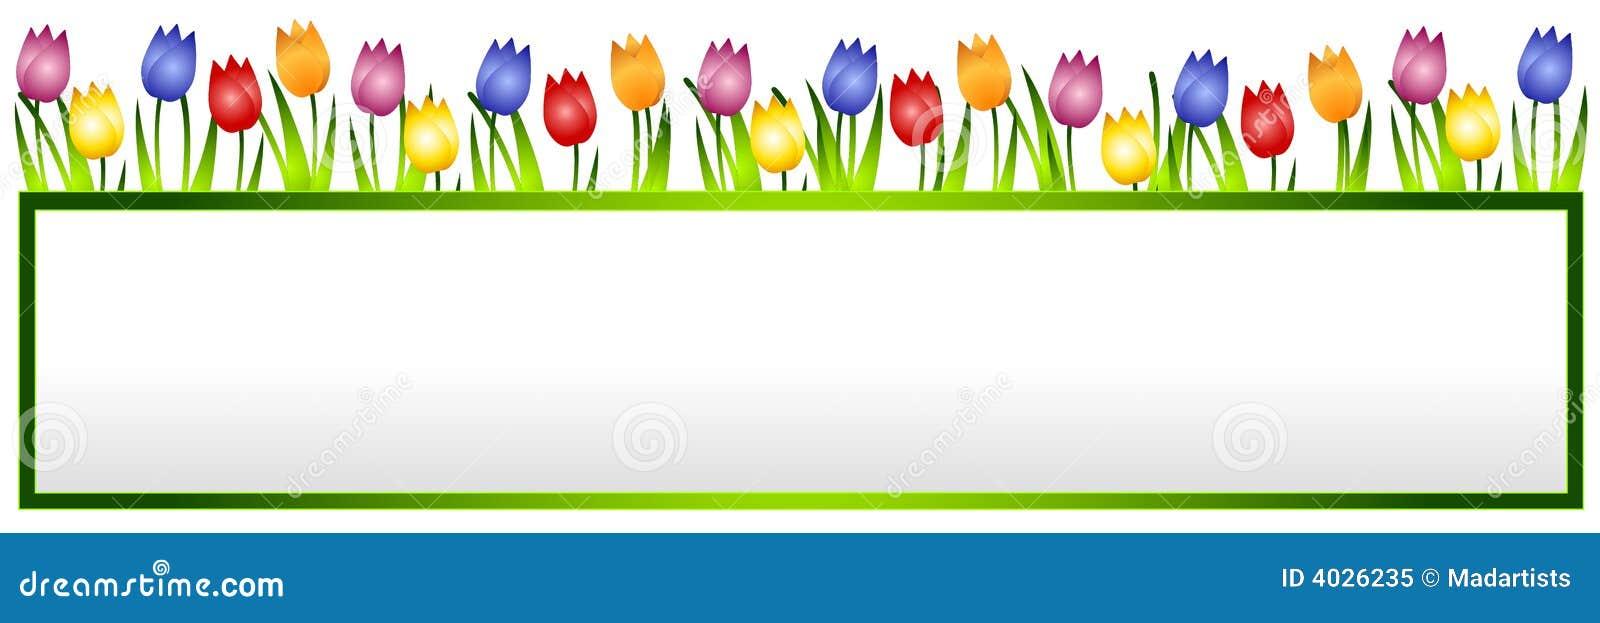 Spring flowers banner clipart mightylinksfo